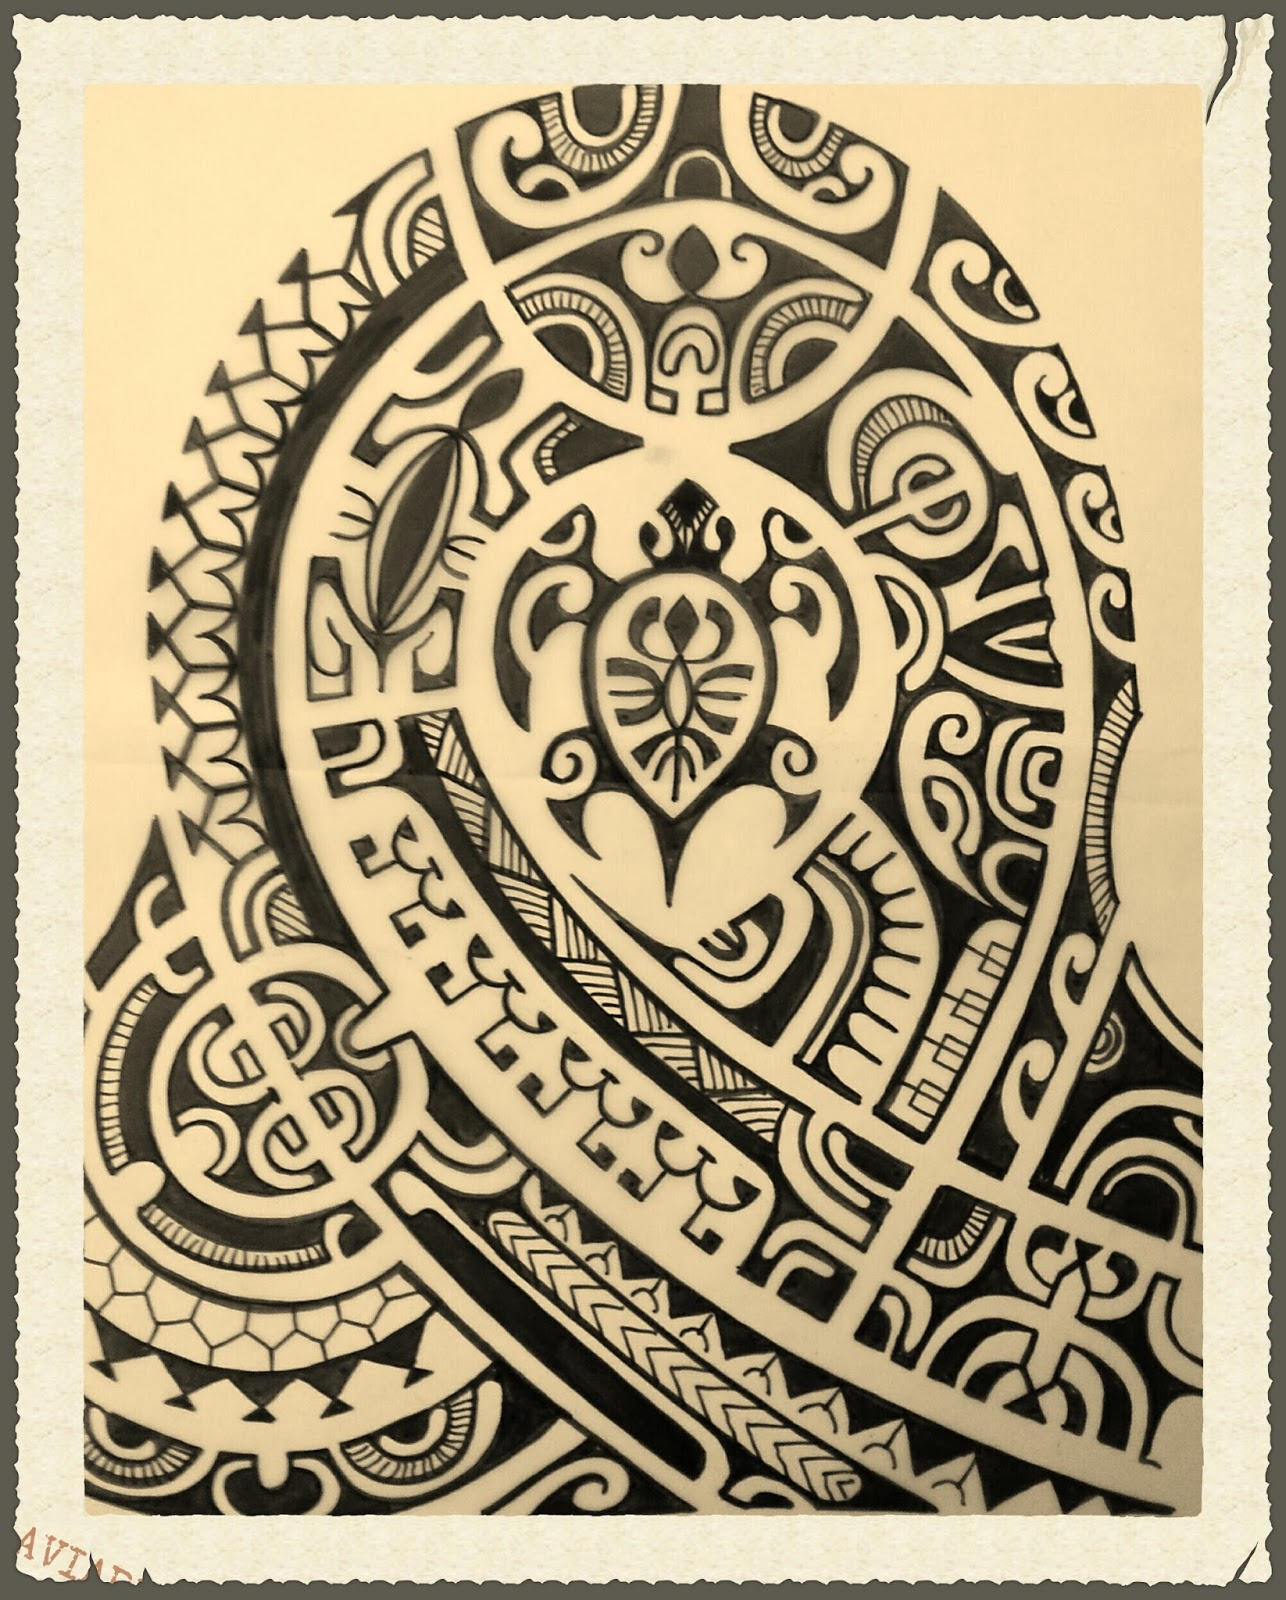 Modèles tatouage Polynésiens et Maoris Tattoo Tatouage - Dessin De Tatouage Polynesien